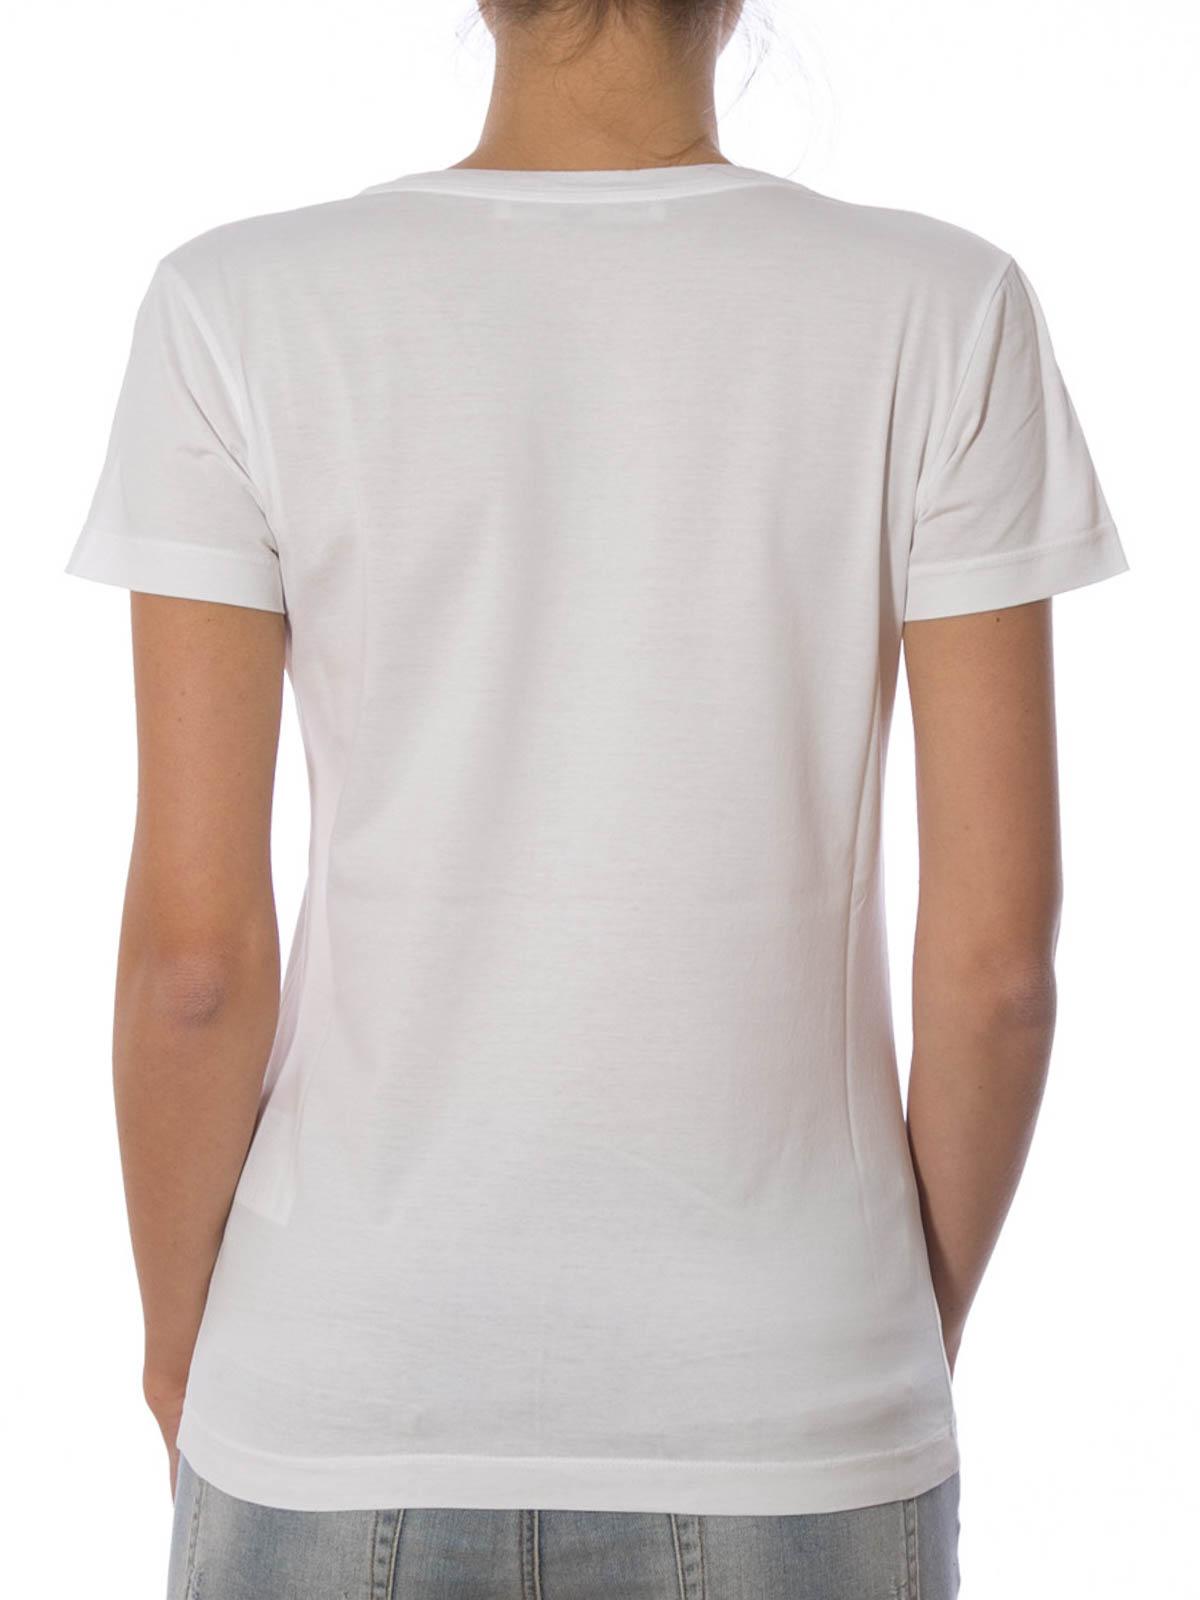 Logo print t shirt by golden goose t shirts ikrix for Printing logos on t shirts